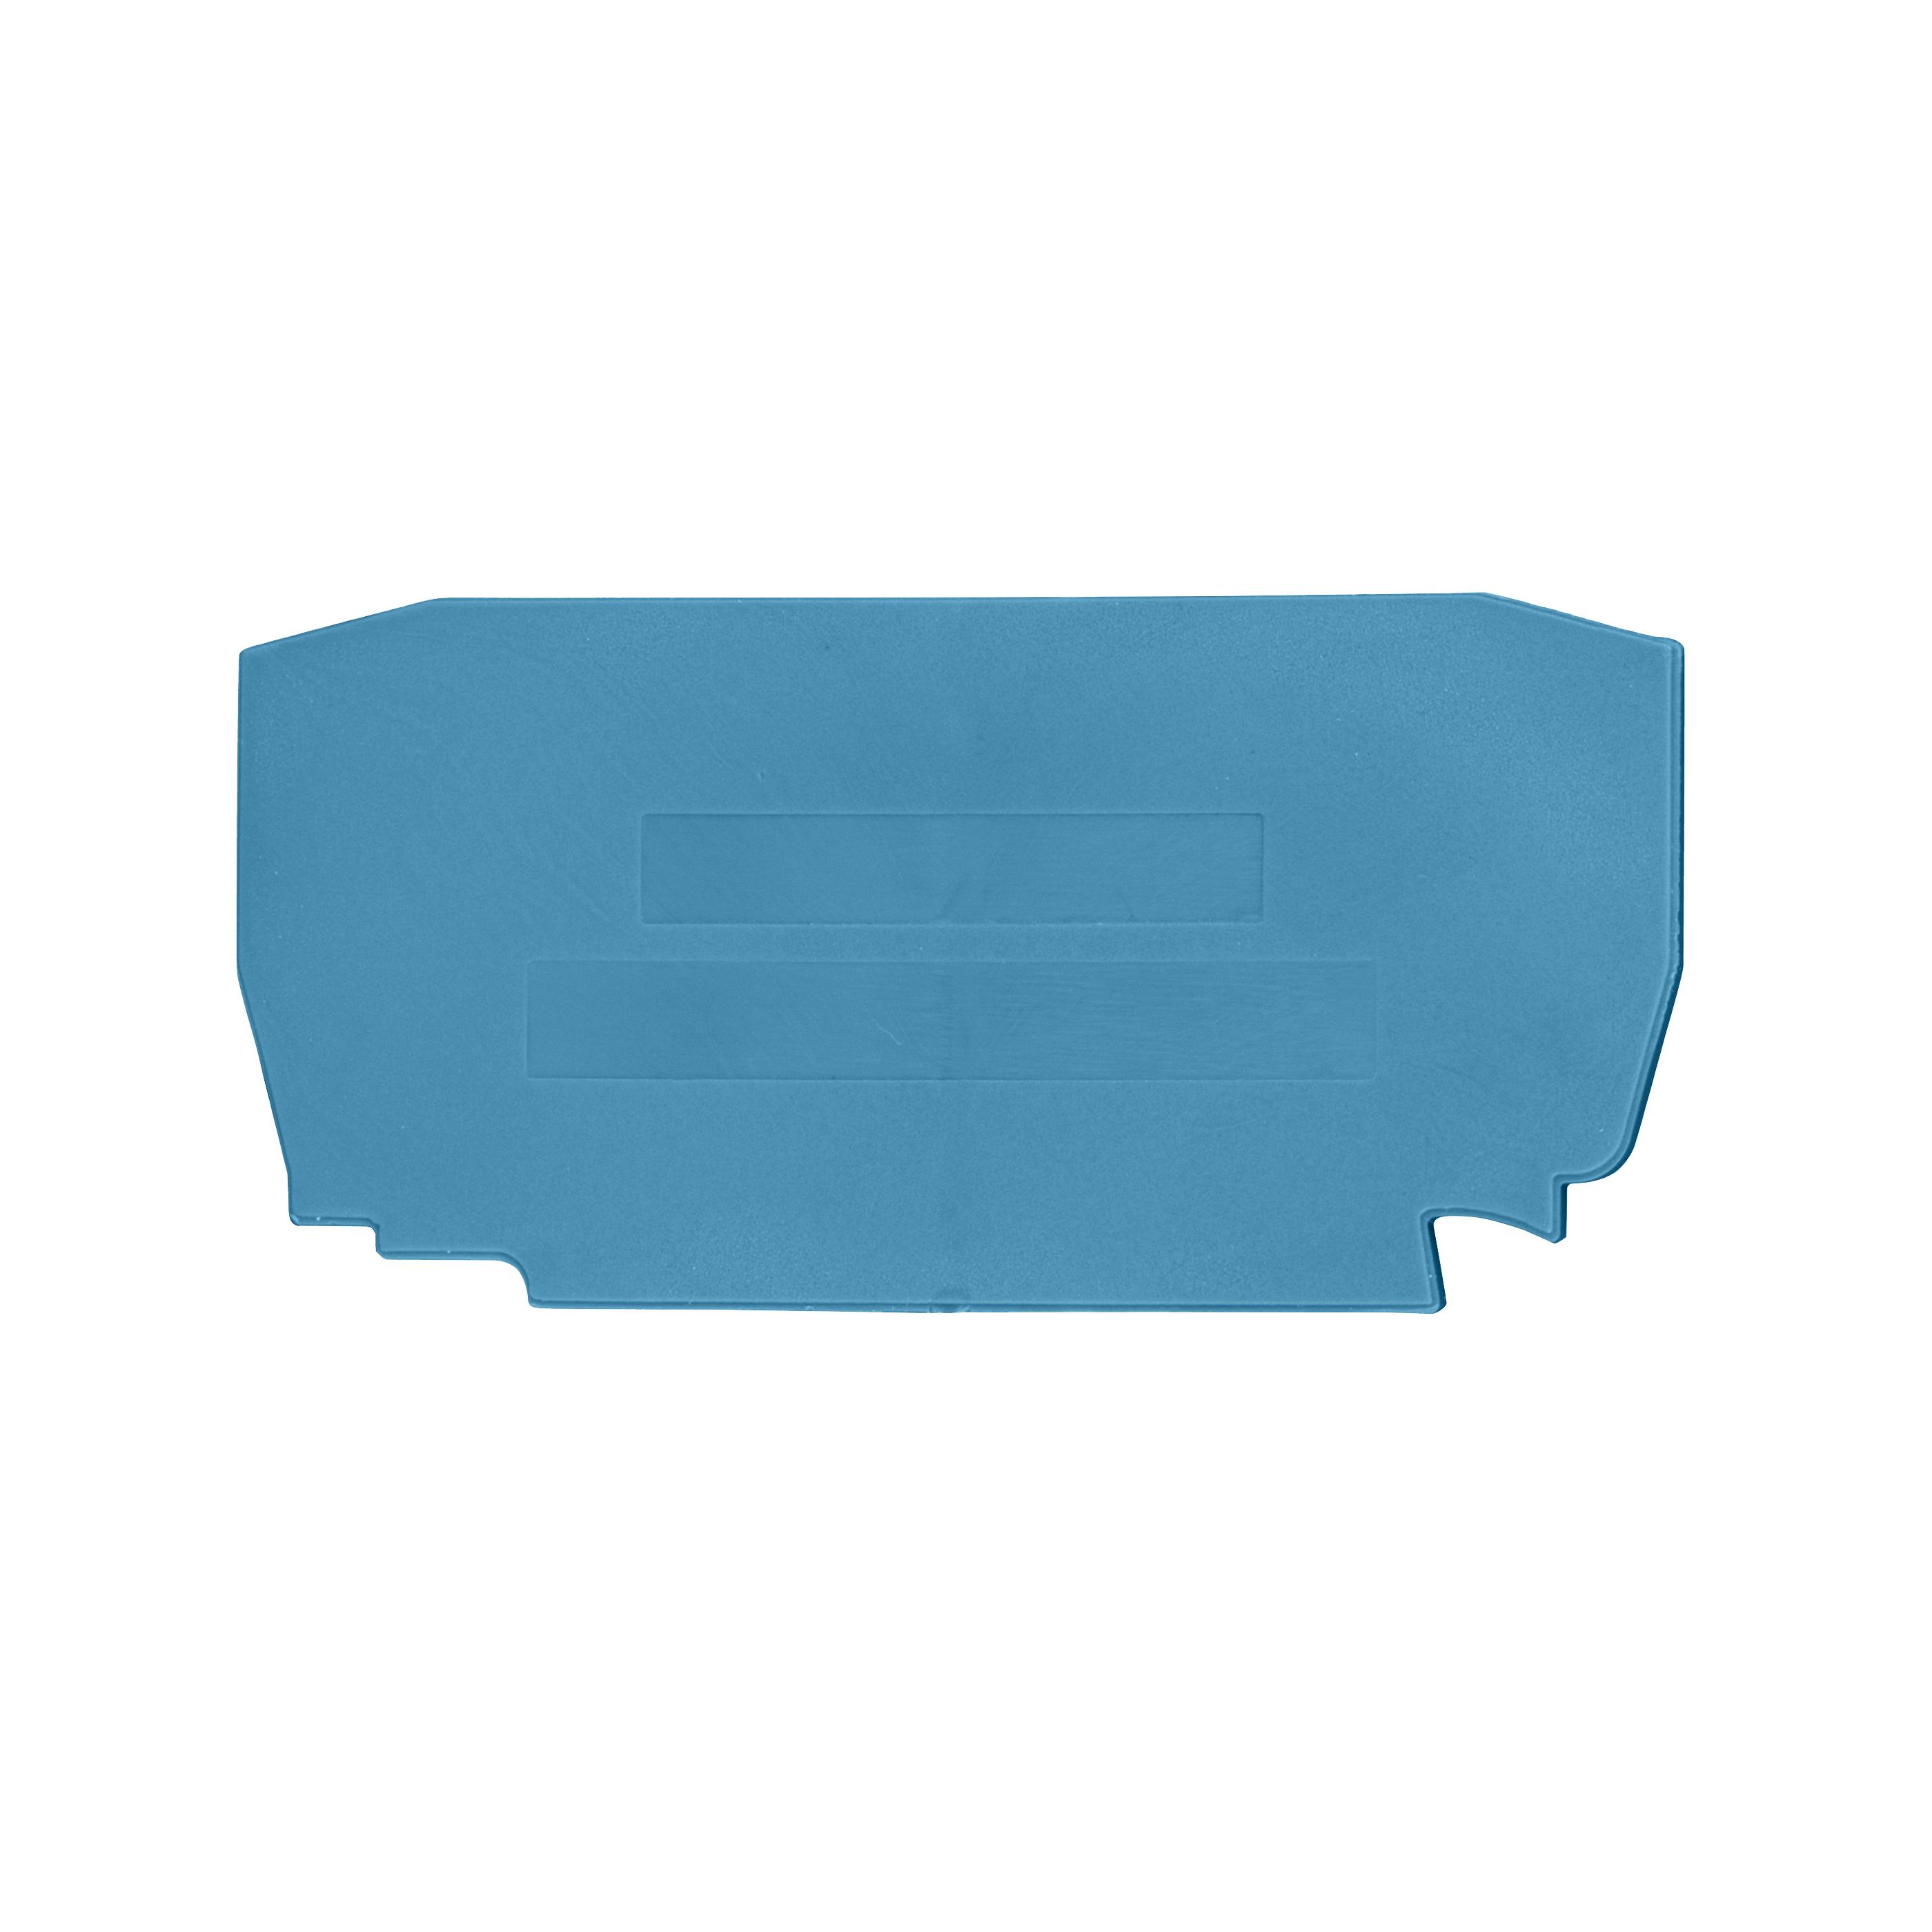 1 Stk Endplatte für Federkraftklemme YBK 2.5 blau IK611202--